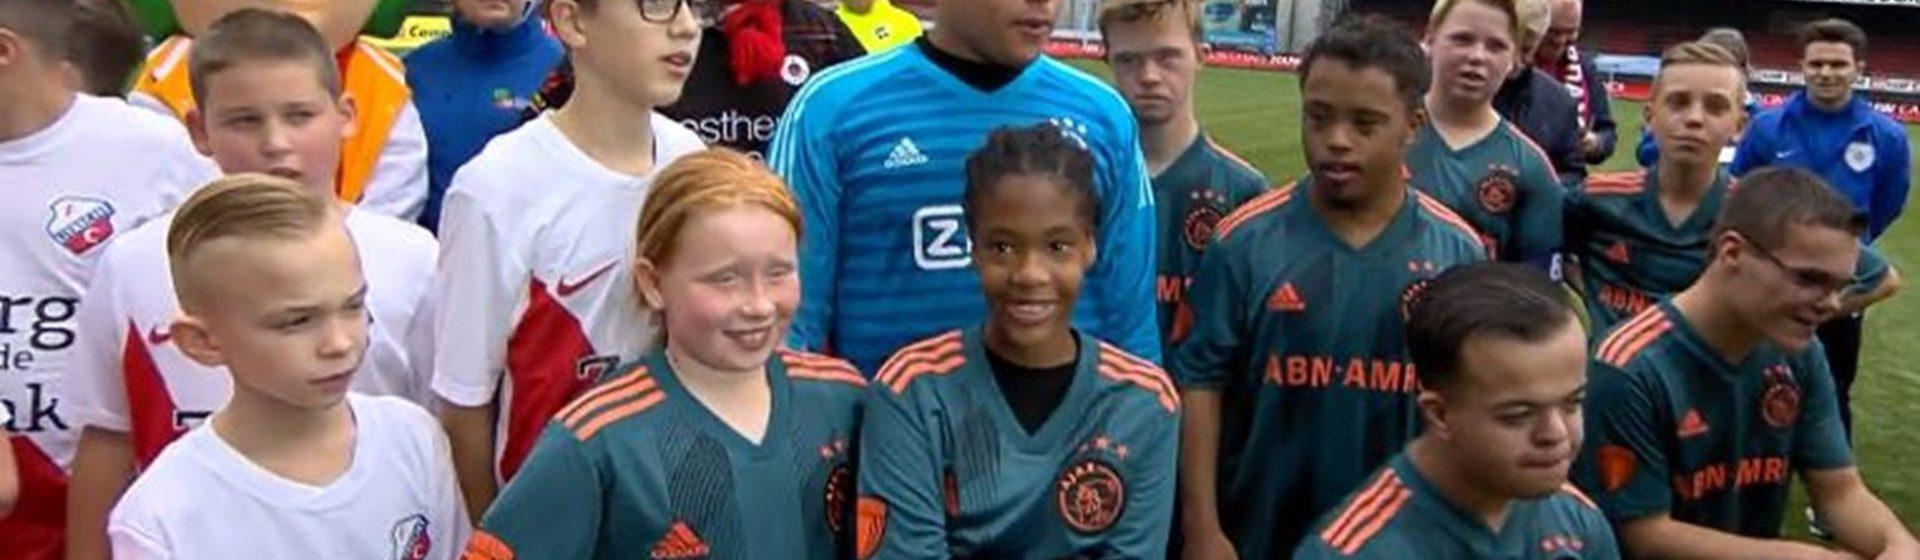 Bijzondere Eredivisie header